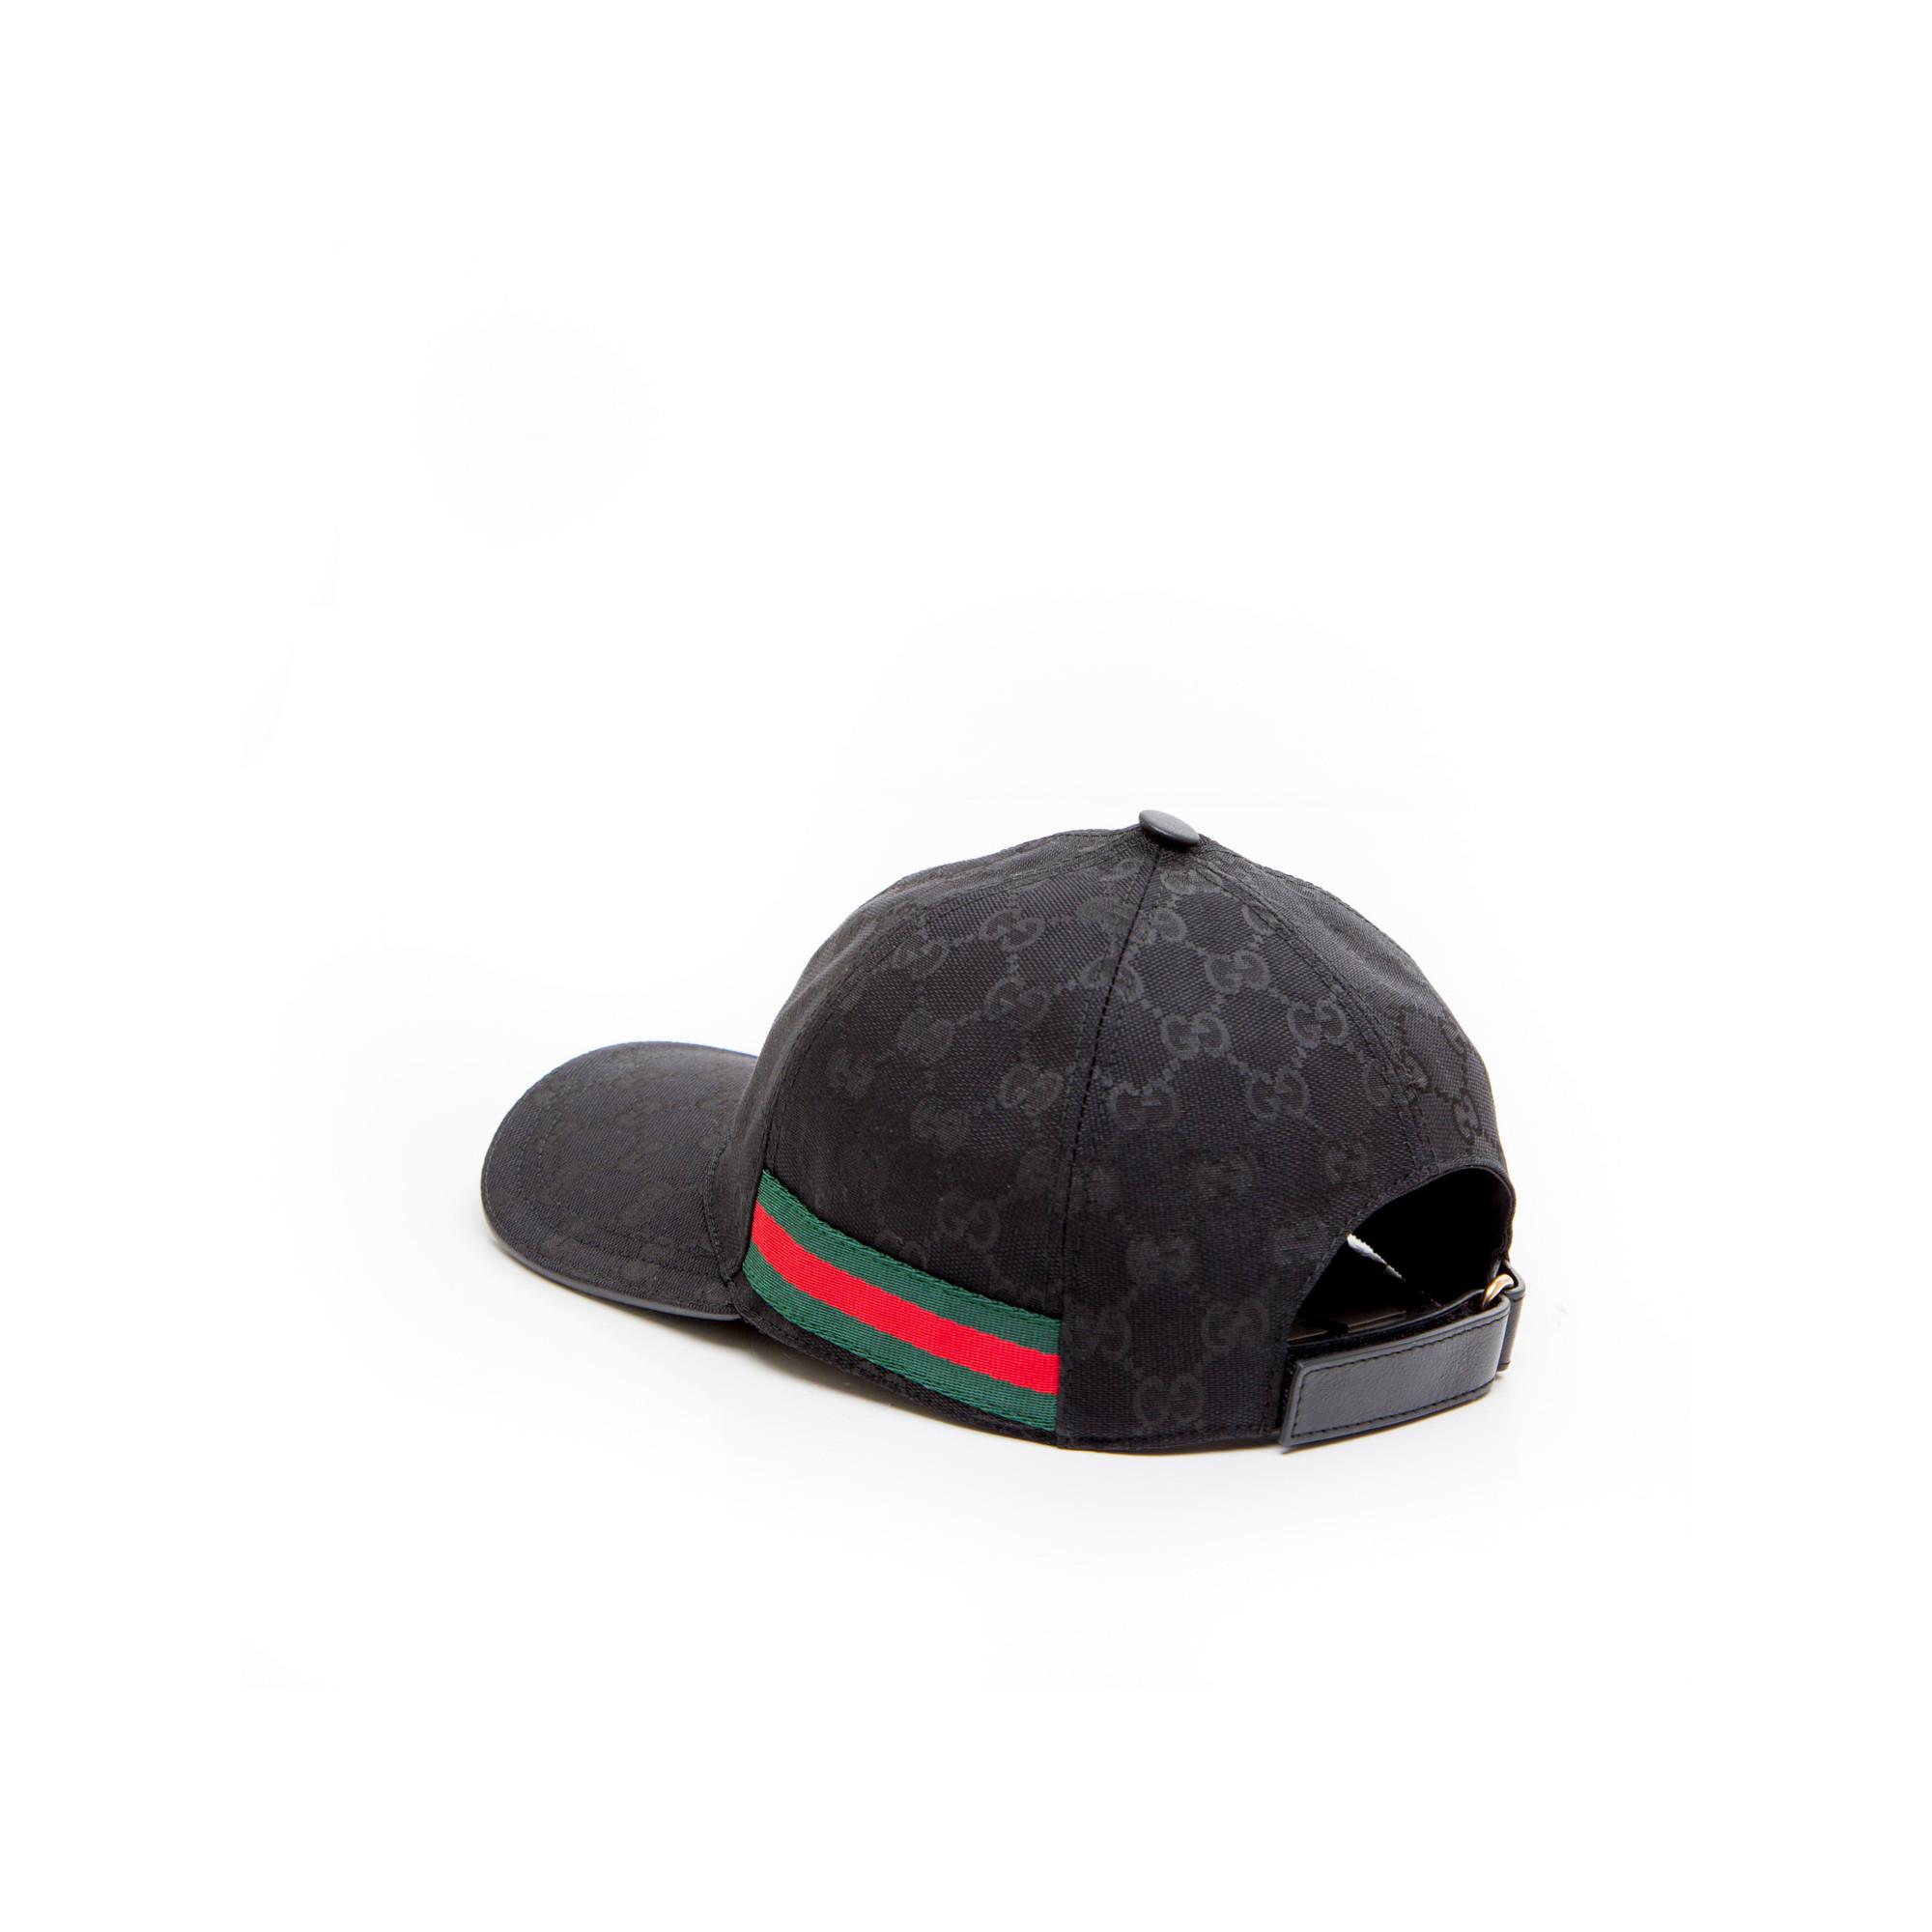 b2fd56f3f Gucci Hat Black | Derodeloper.com